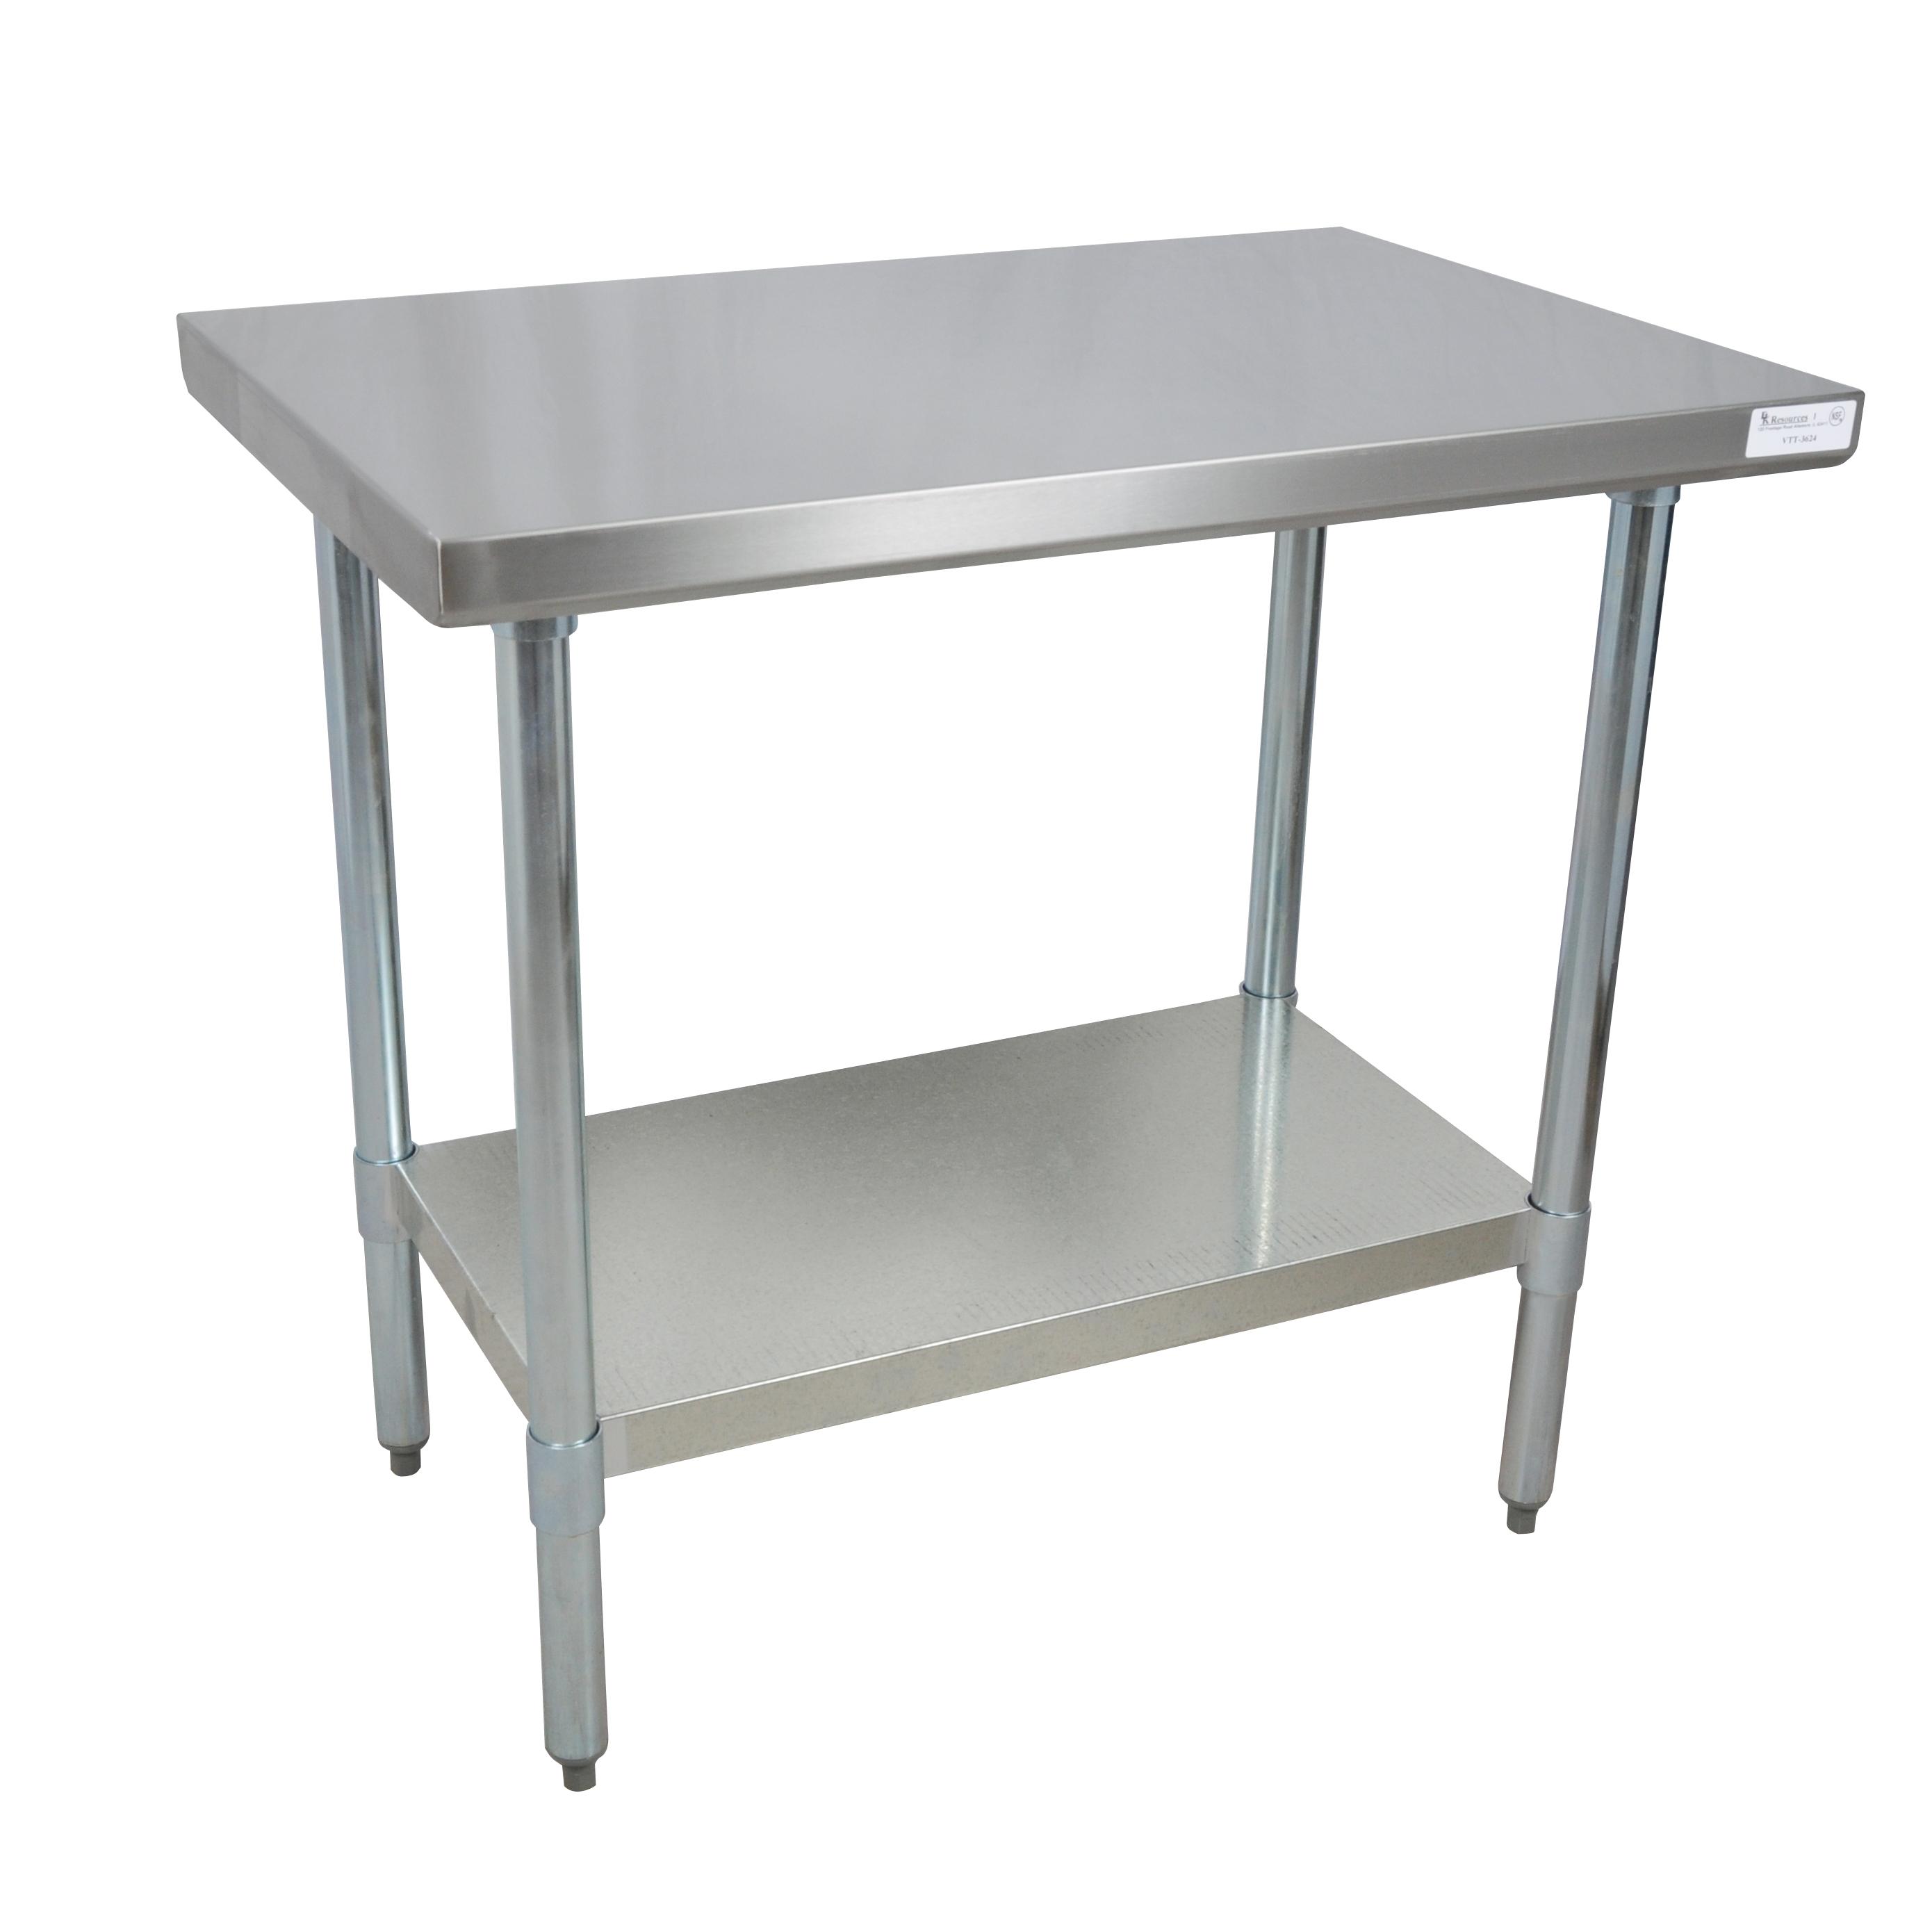 BK Resources CVT-6030 work table,  54